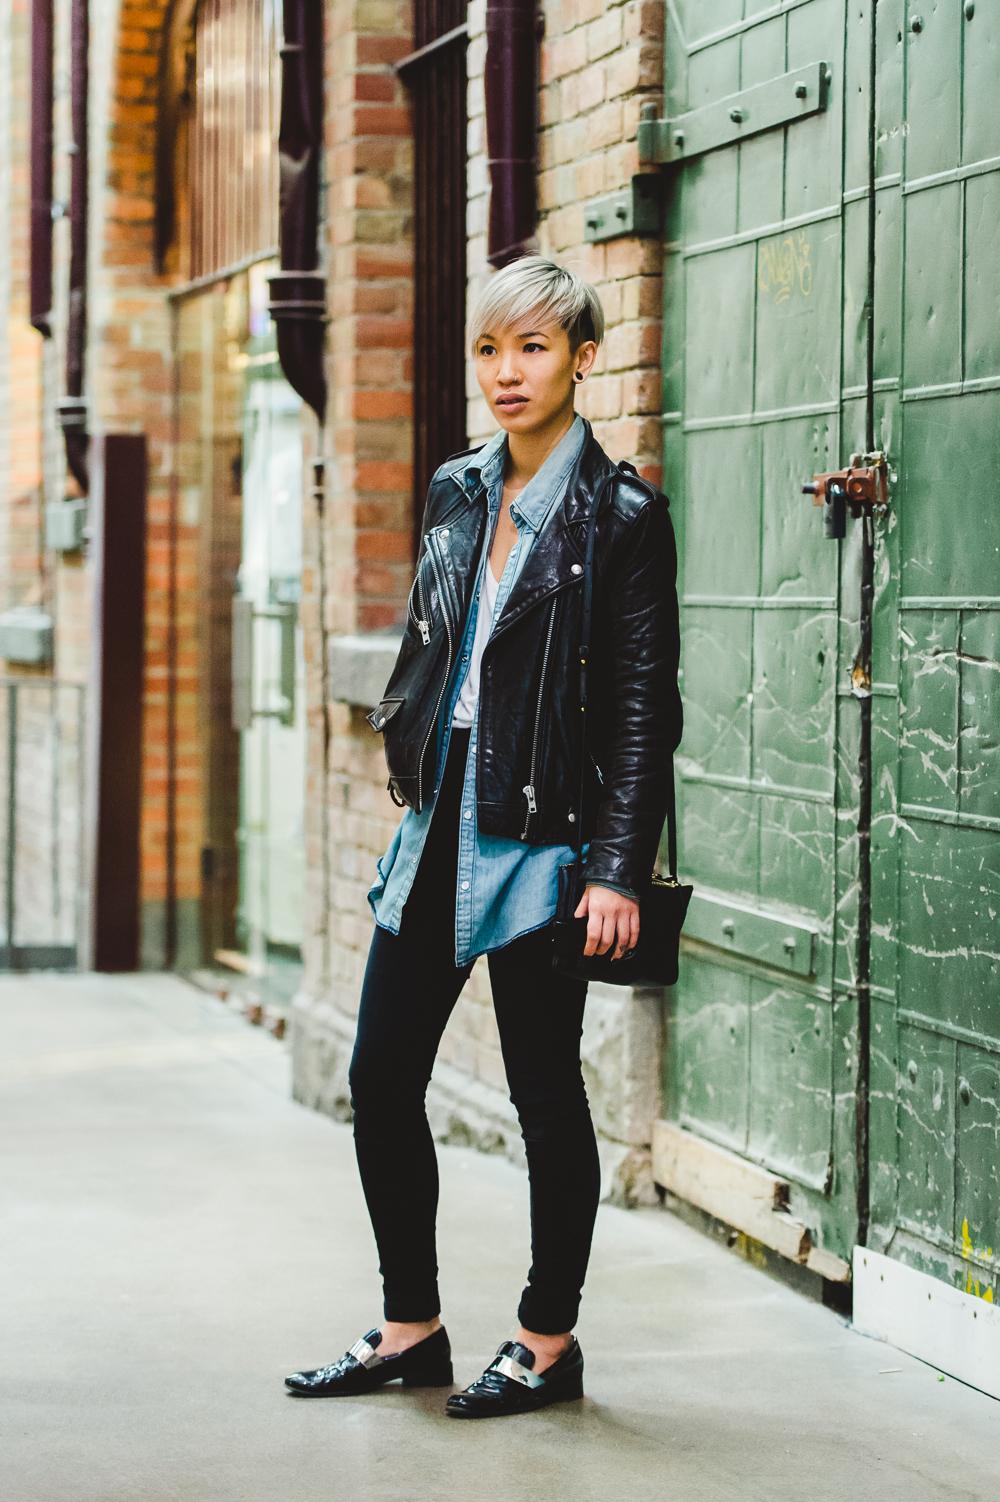 melbourne-street-style-biker-jacket